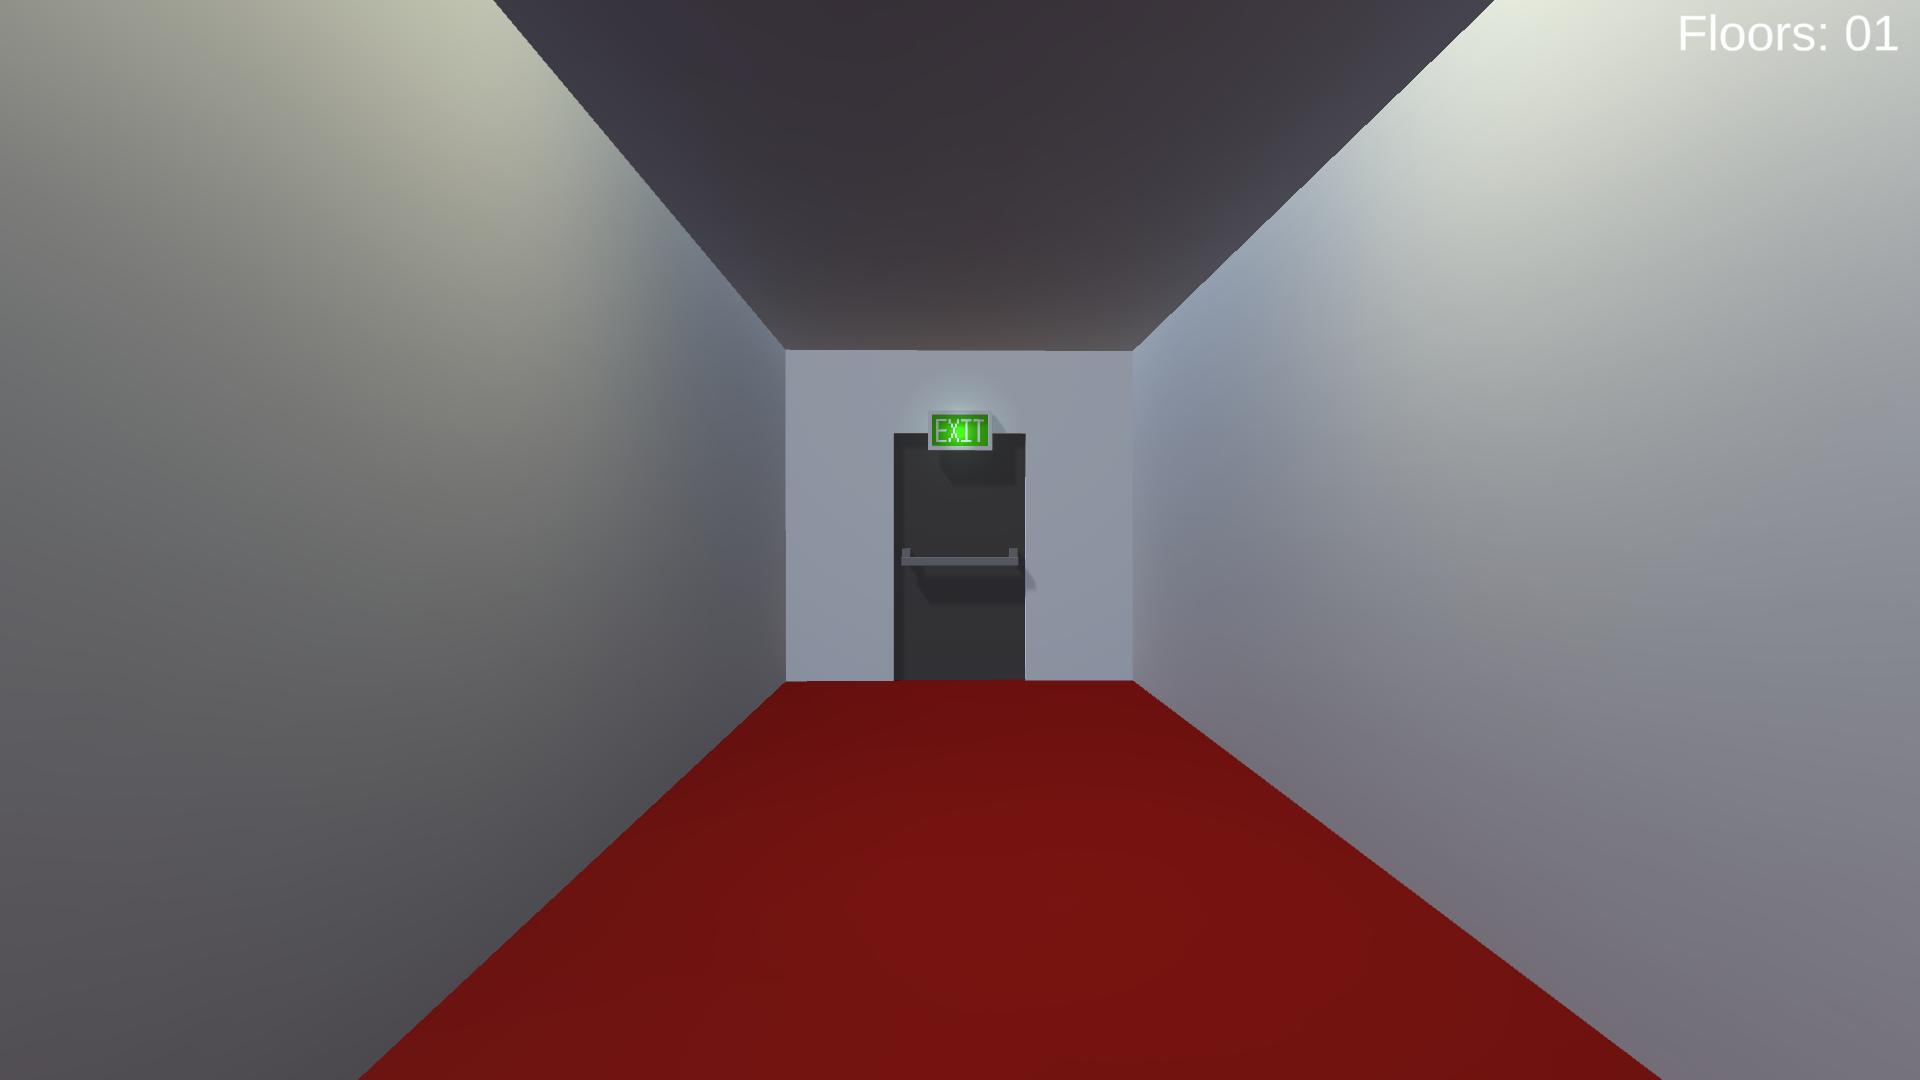 Exit Door Closed